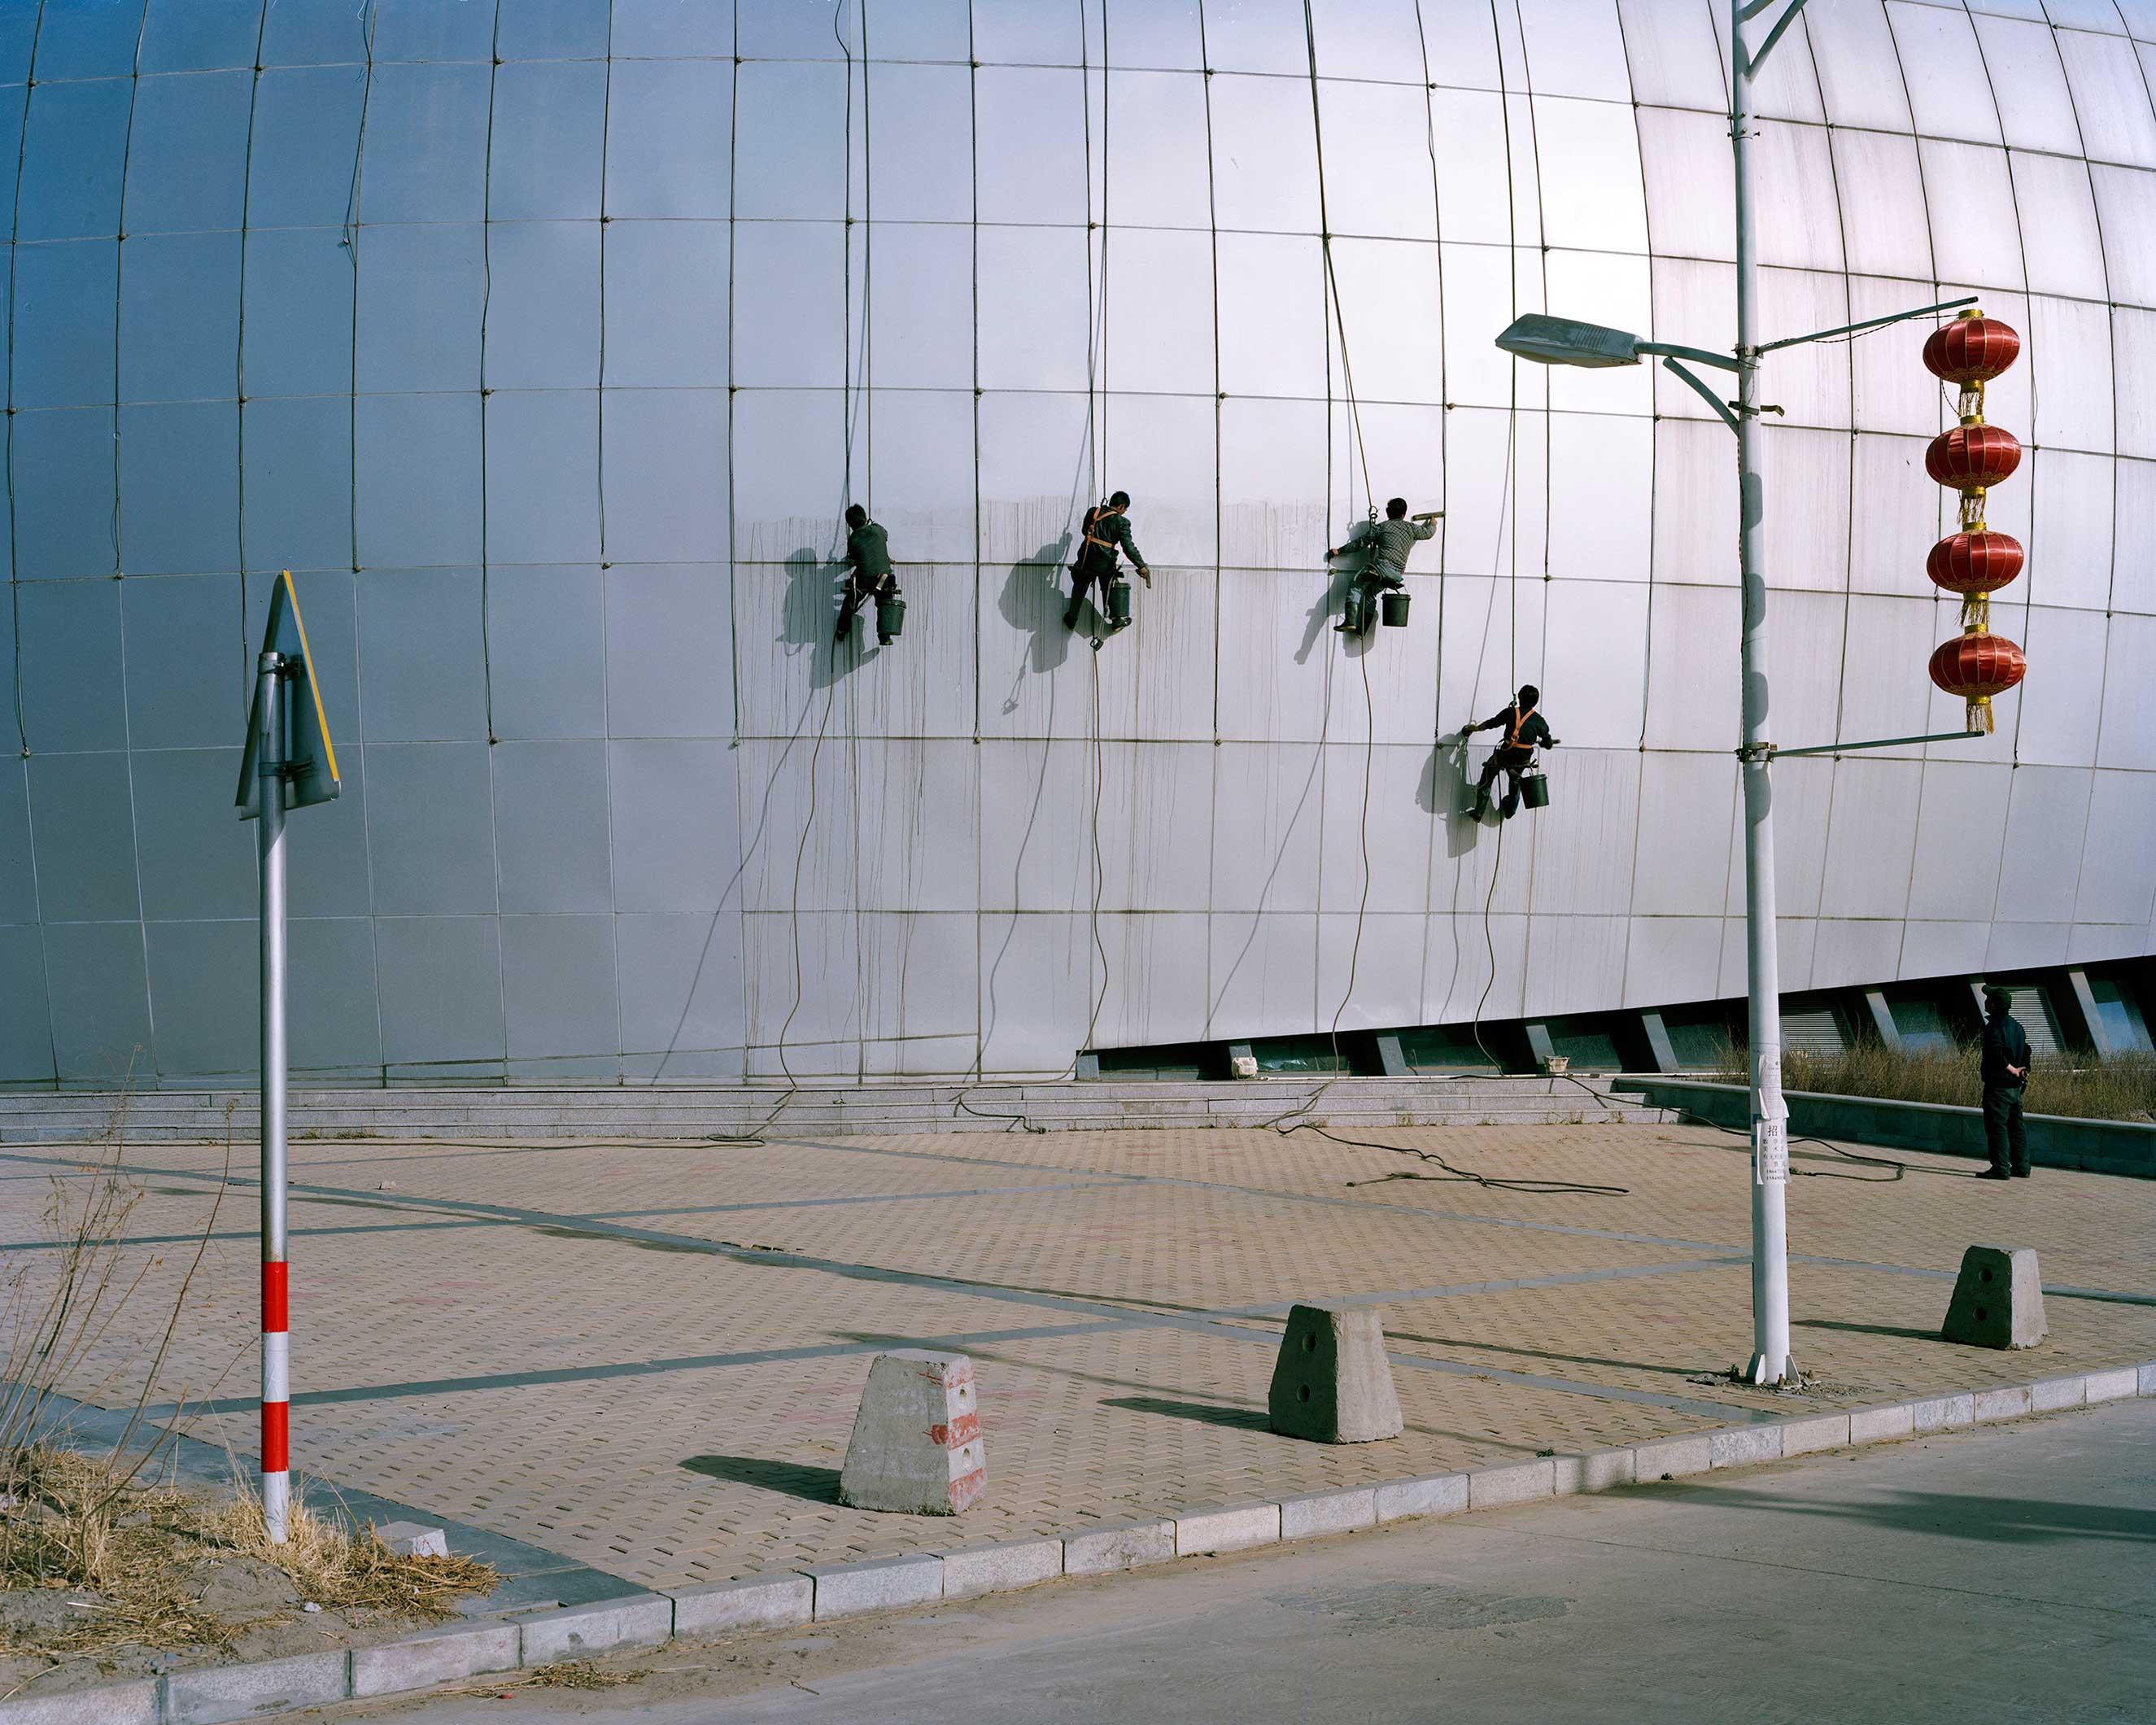 Wuhaï, Inner Mongolia, April 2013. University Gymnasium.